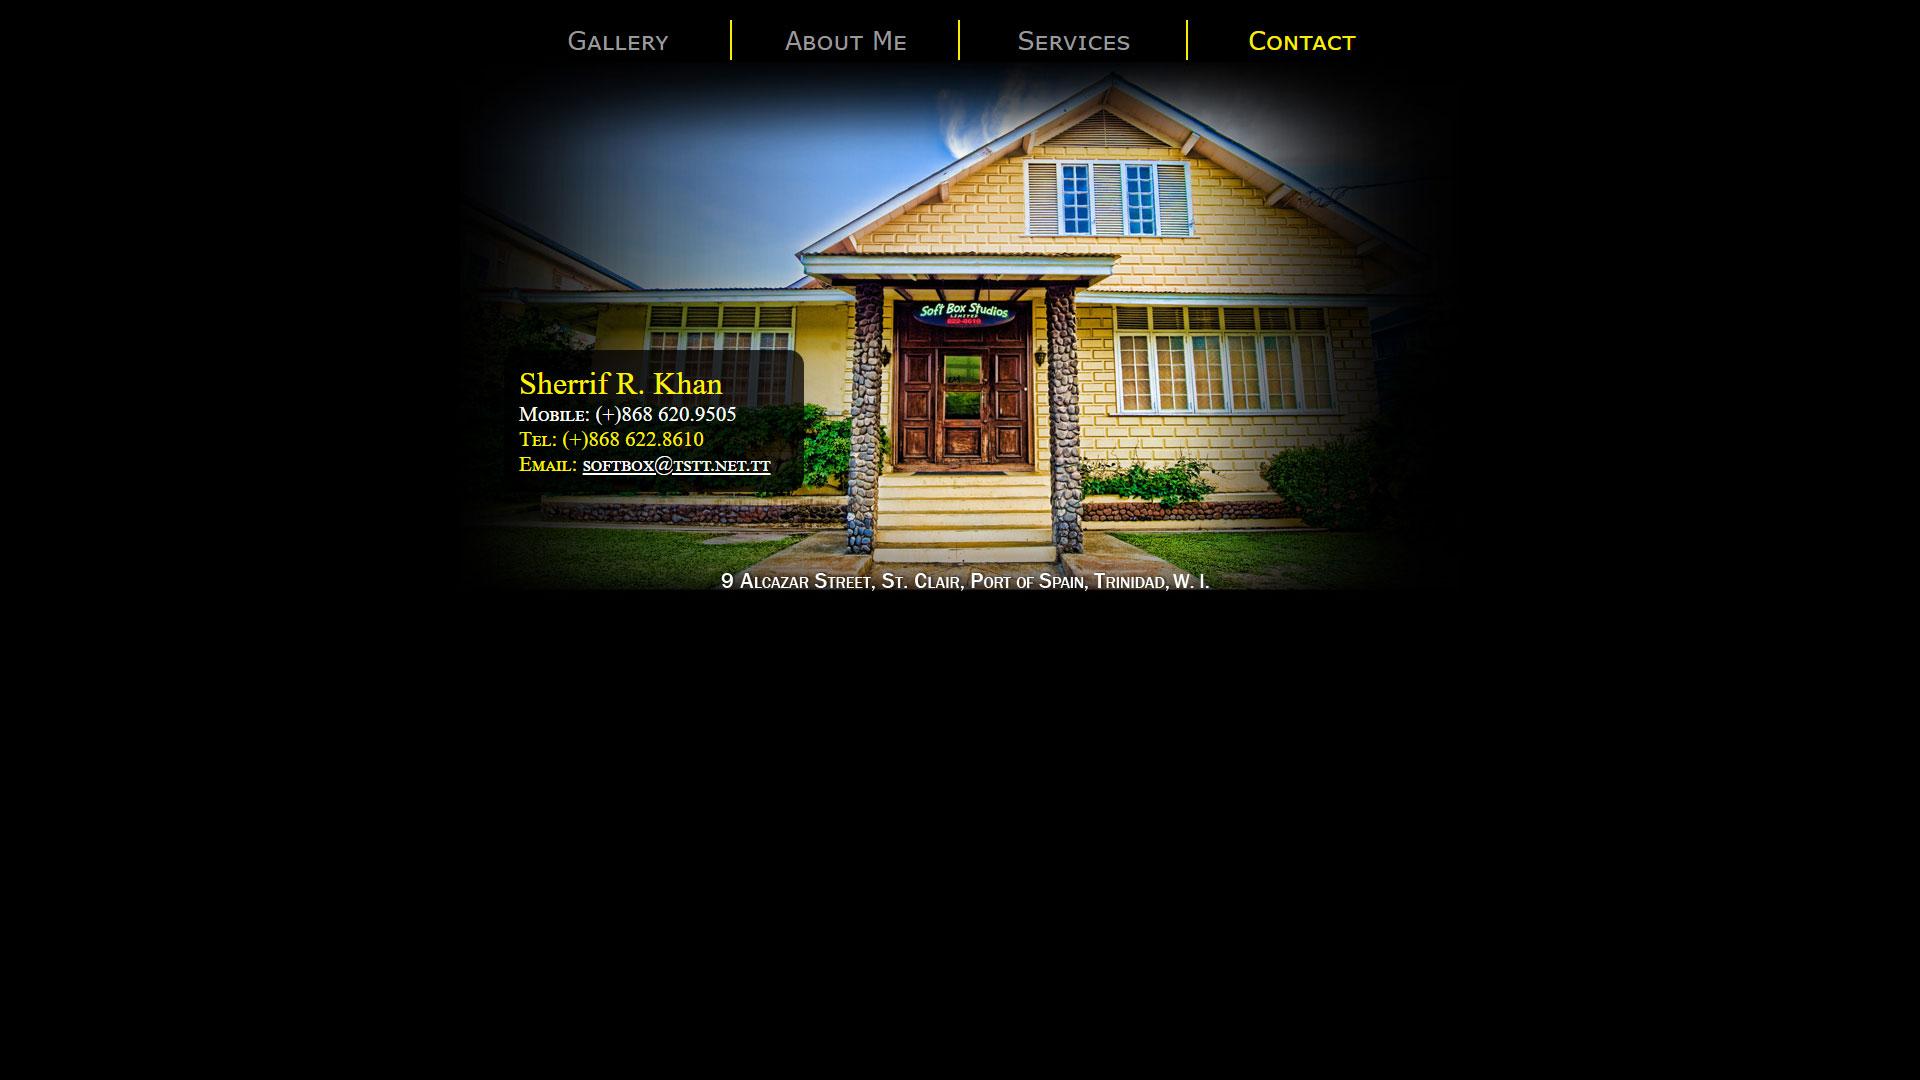 Softbox Studios Website